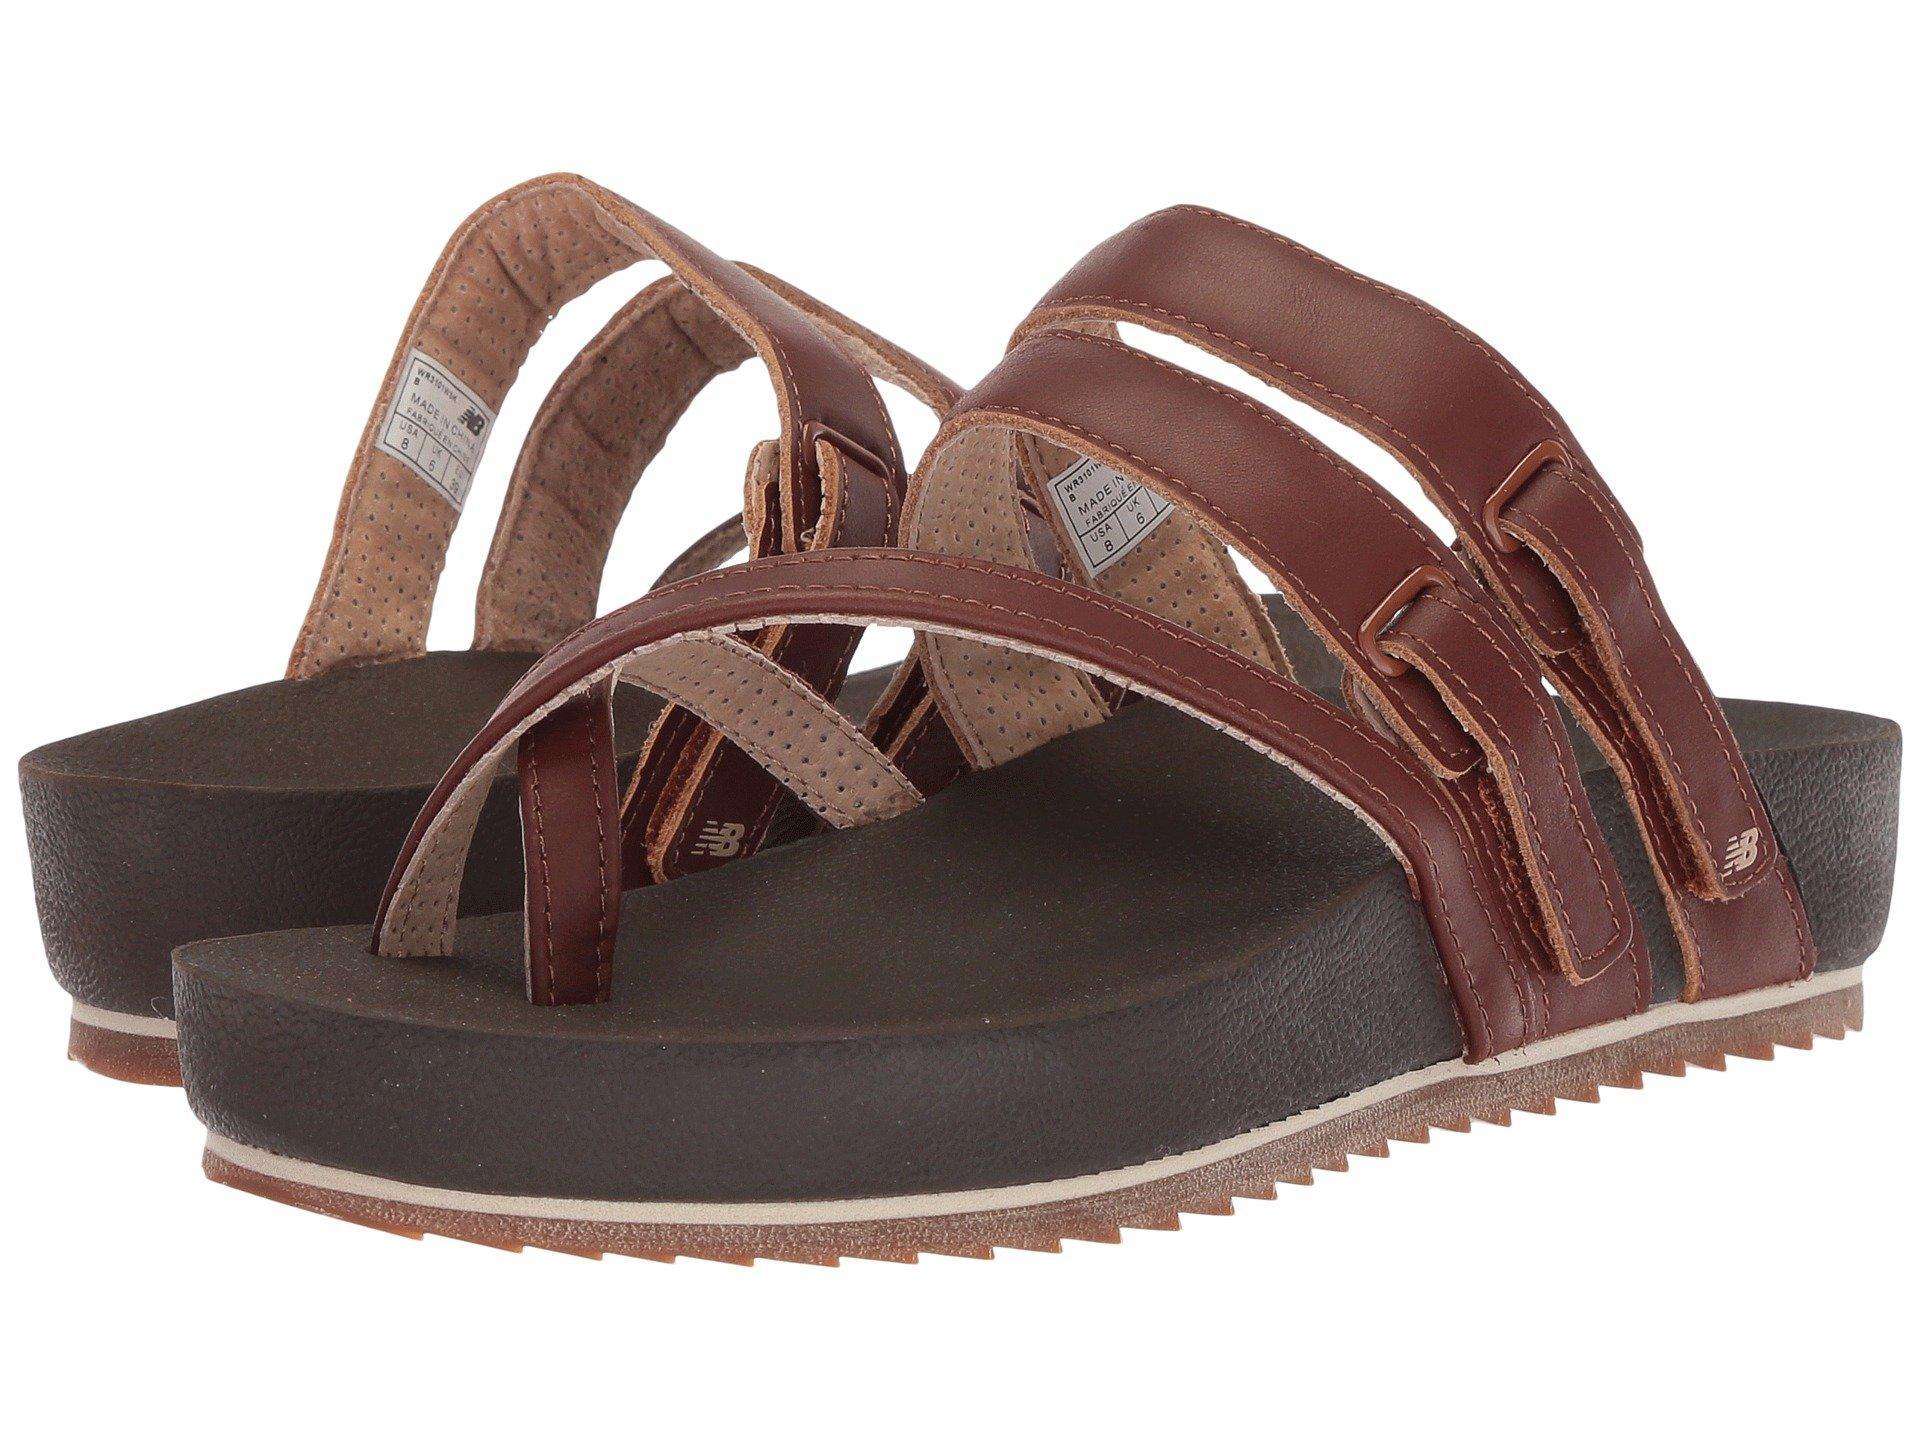 New Balance Leather Traveler Sandal in